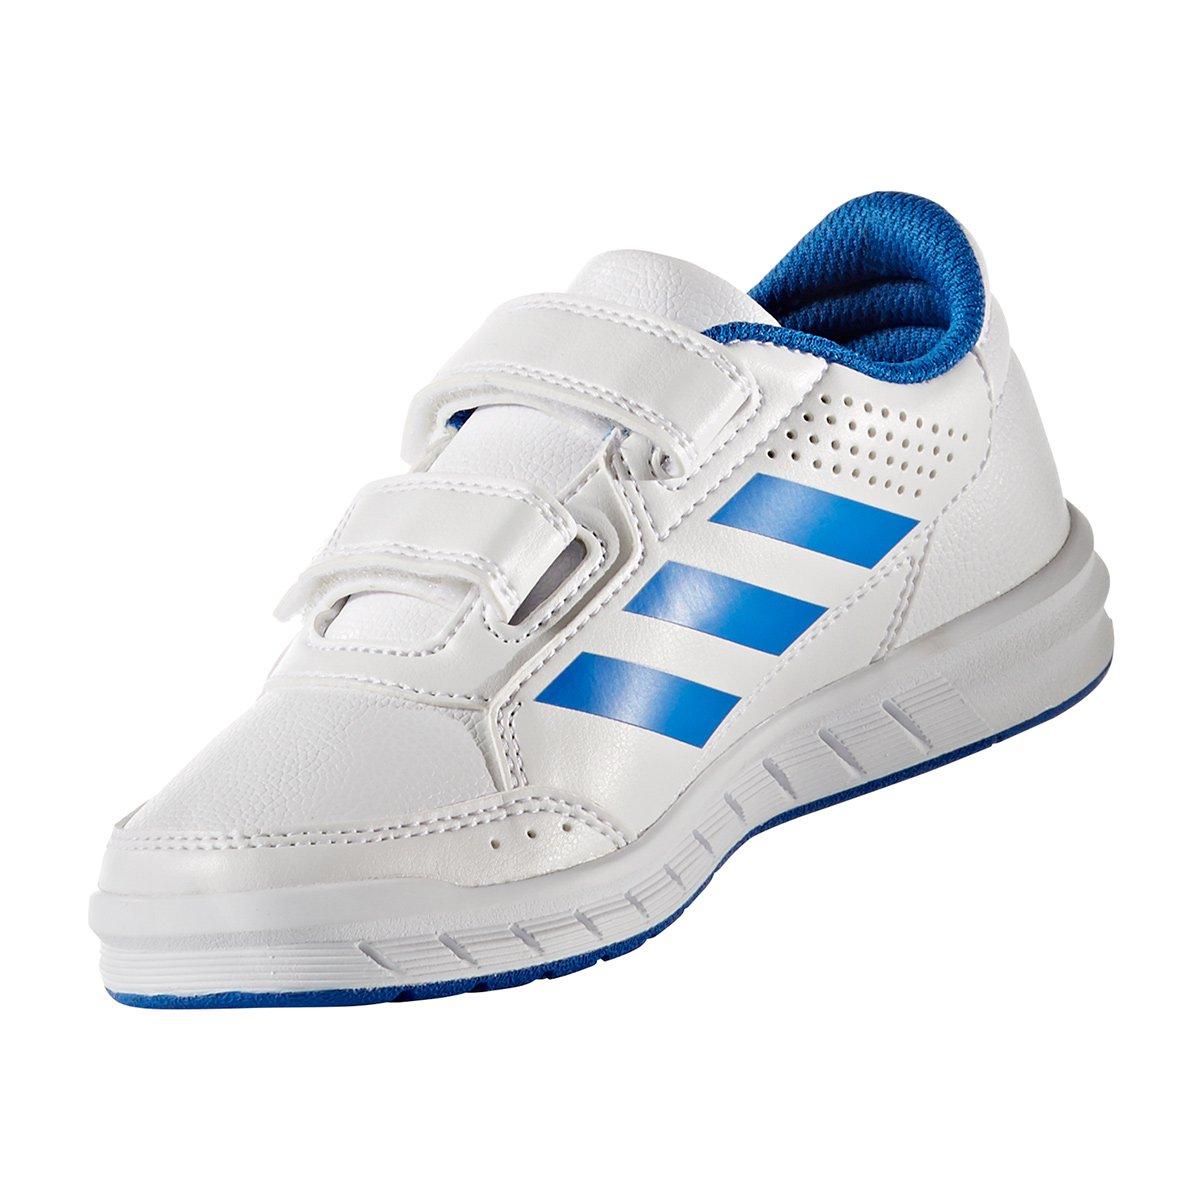 8f07a8cd5a7 35%OFF Tênis Infantil Adidas Altasport Cf K Velcro